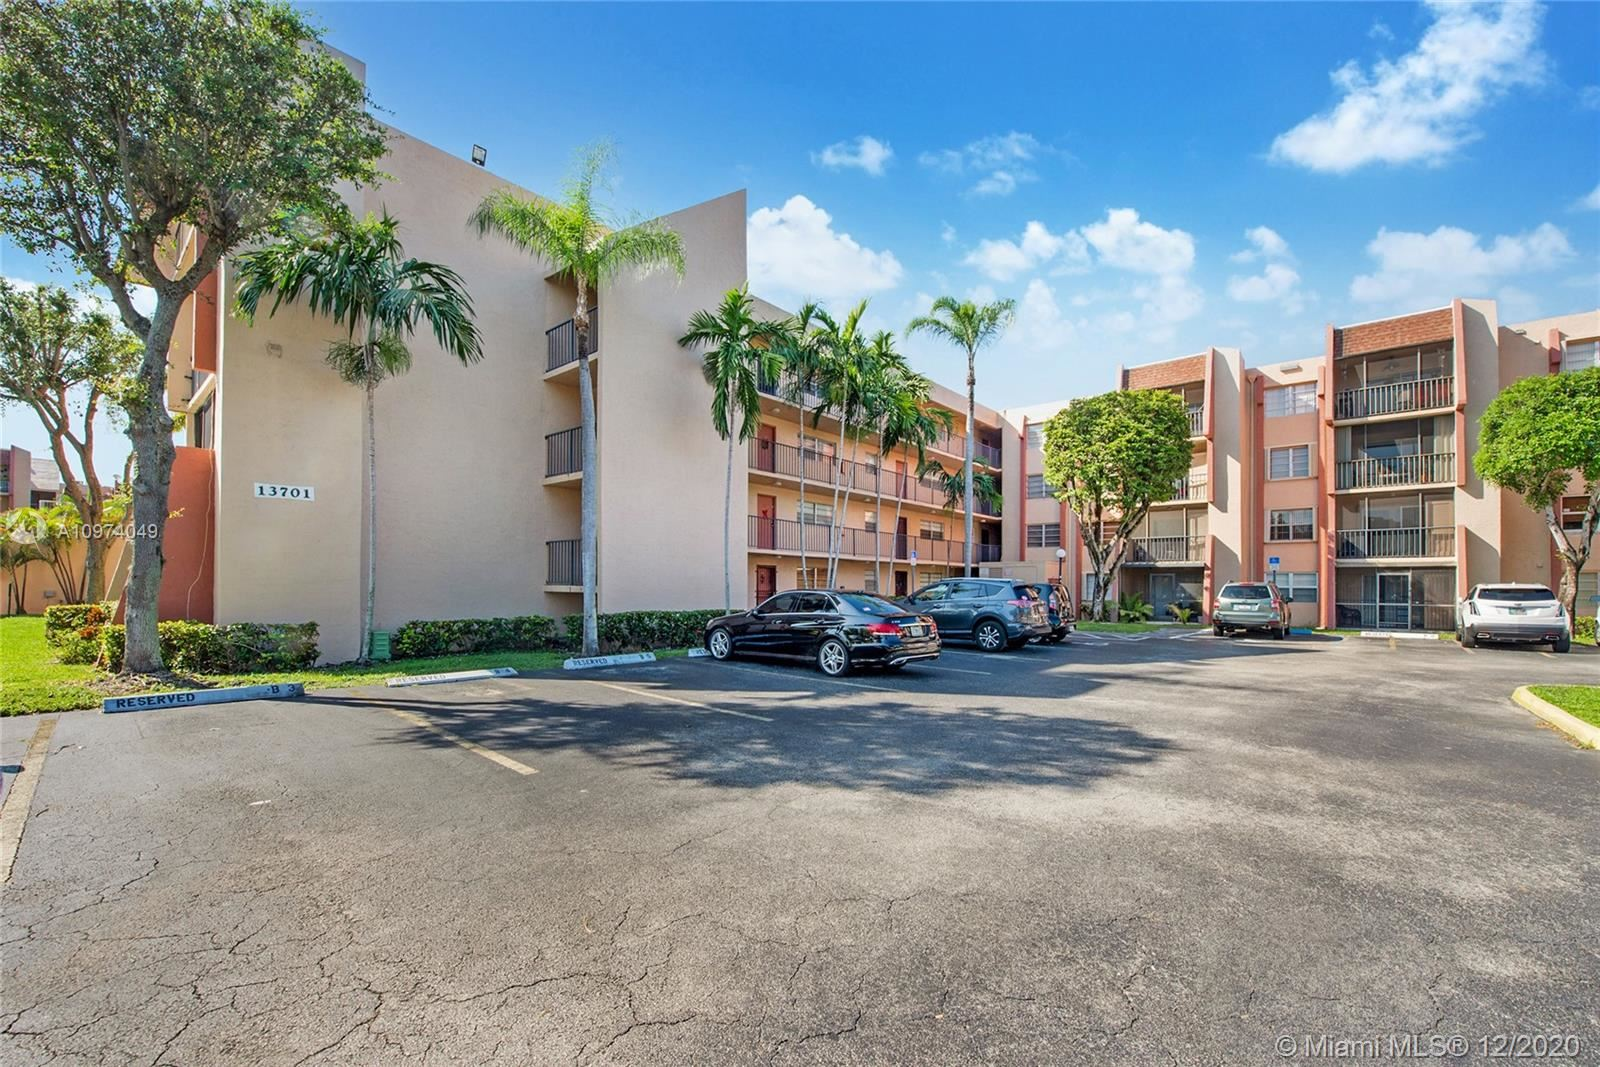 13701 Kendale Lakes Cir #B-316, Miami, FL 33183 - #: A10974049